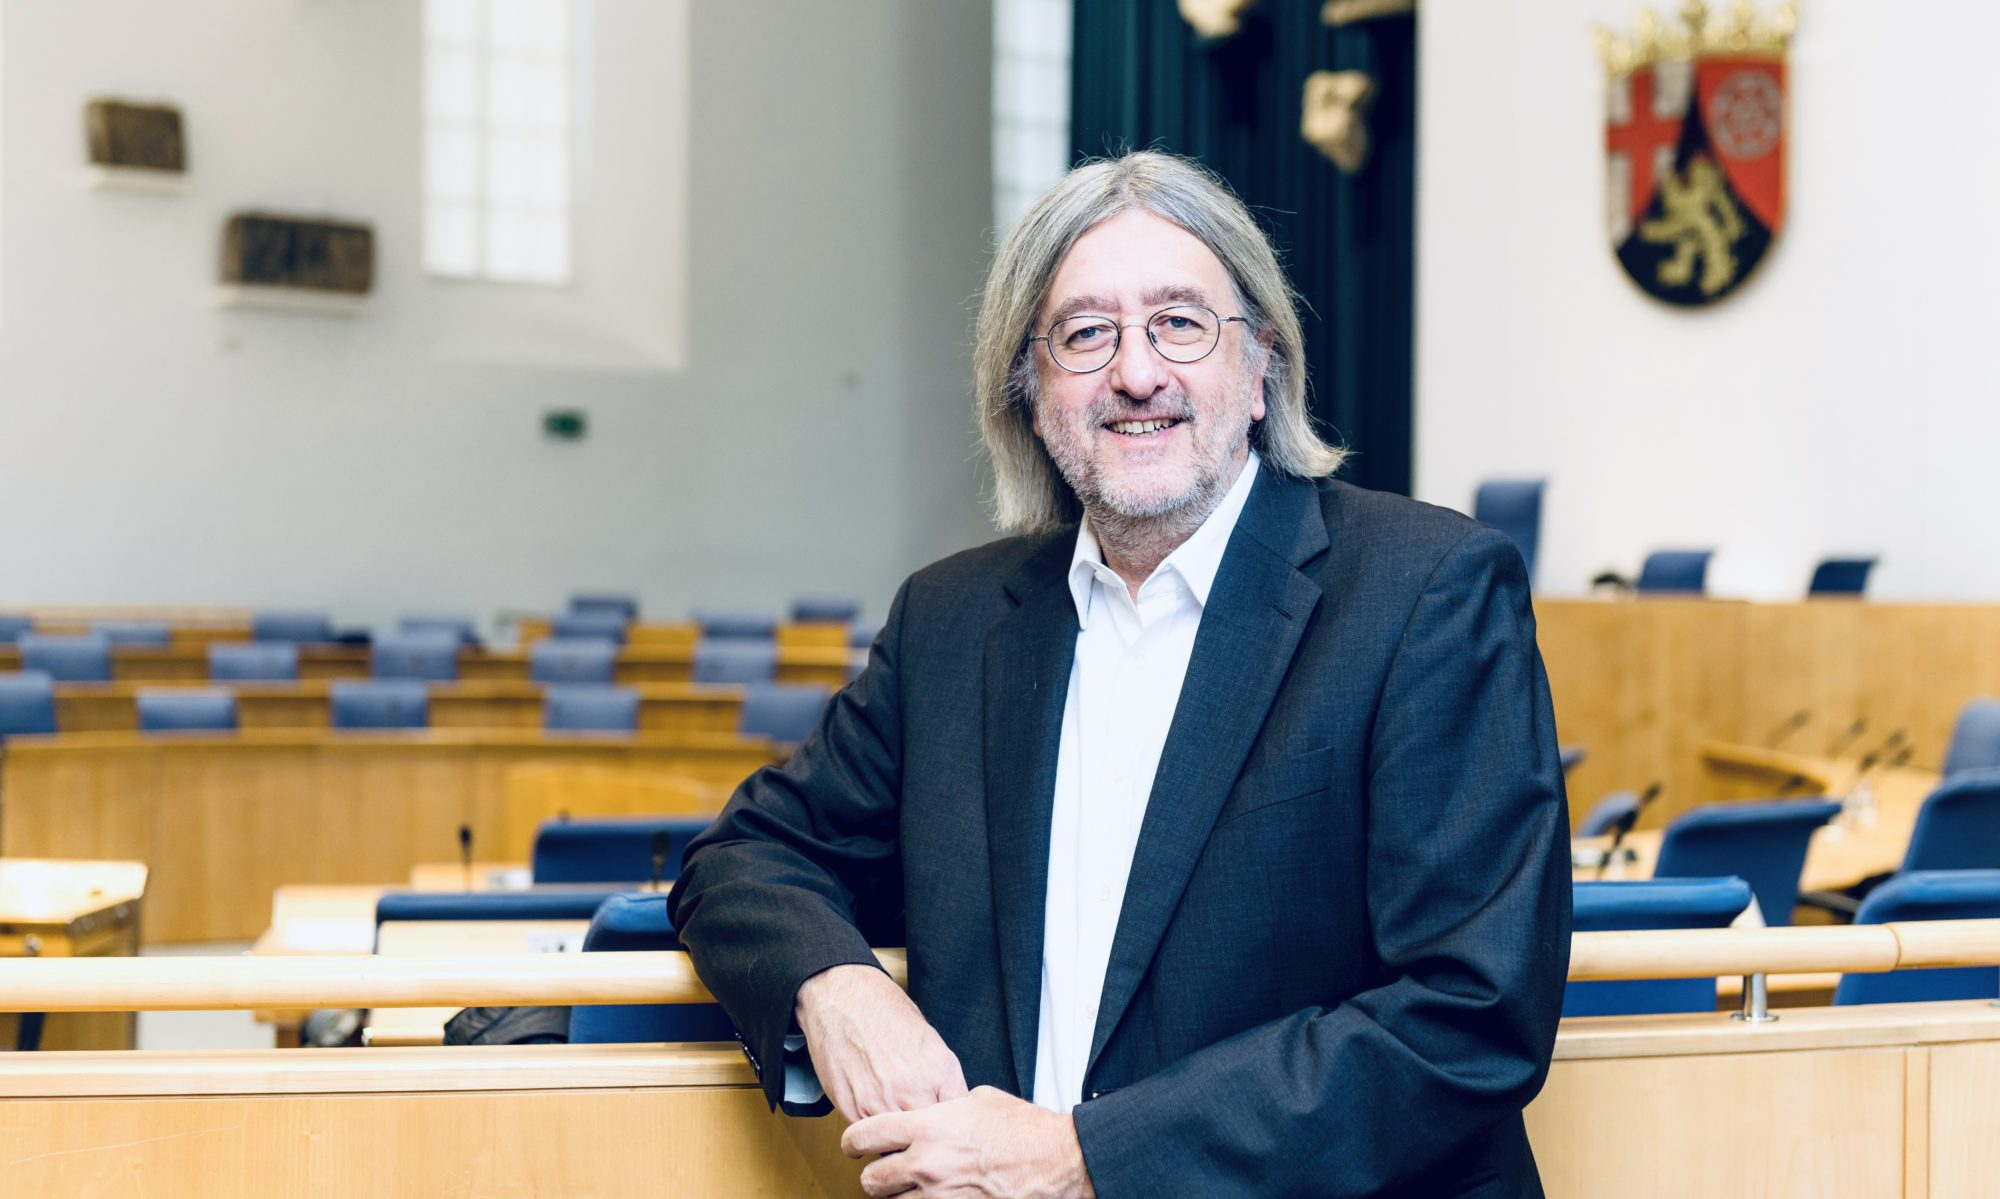 Dr. Bernhard Braun